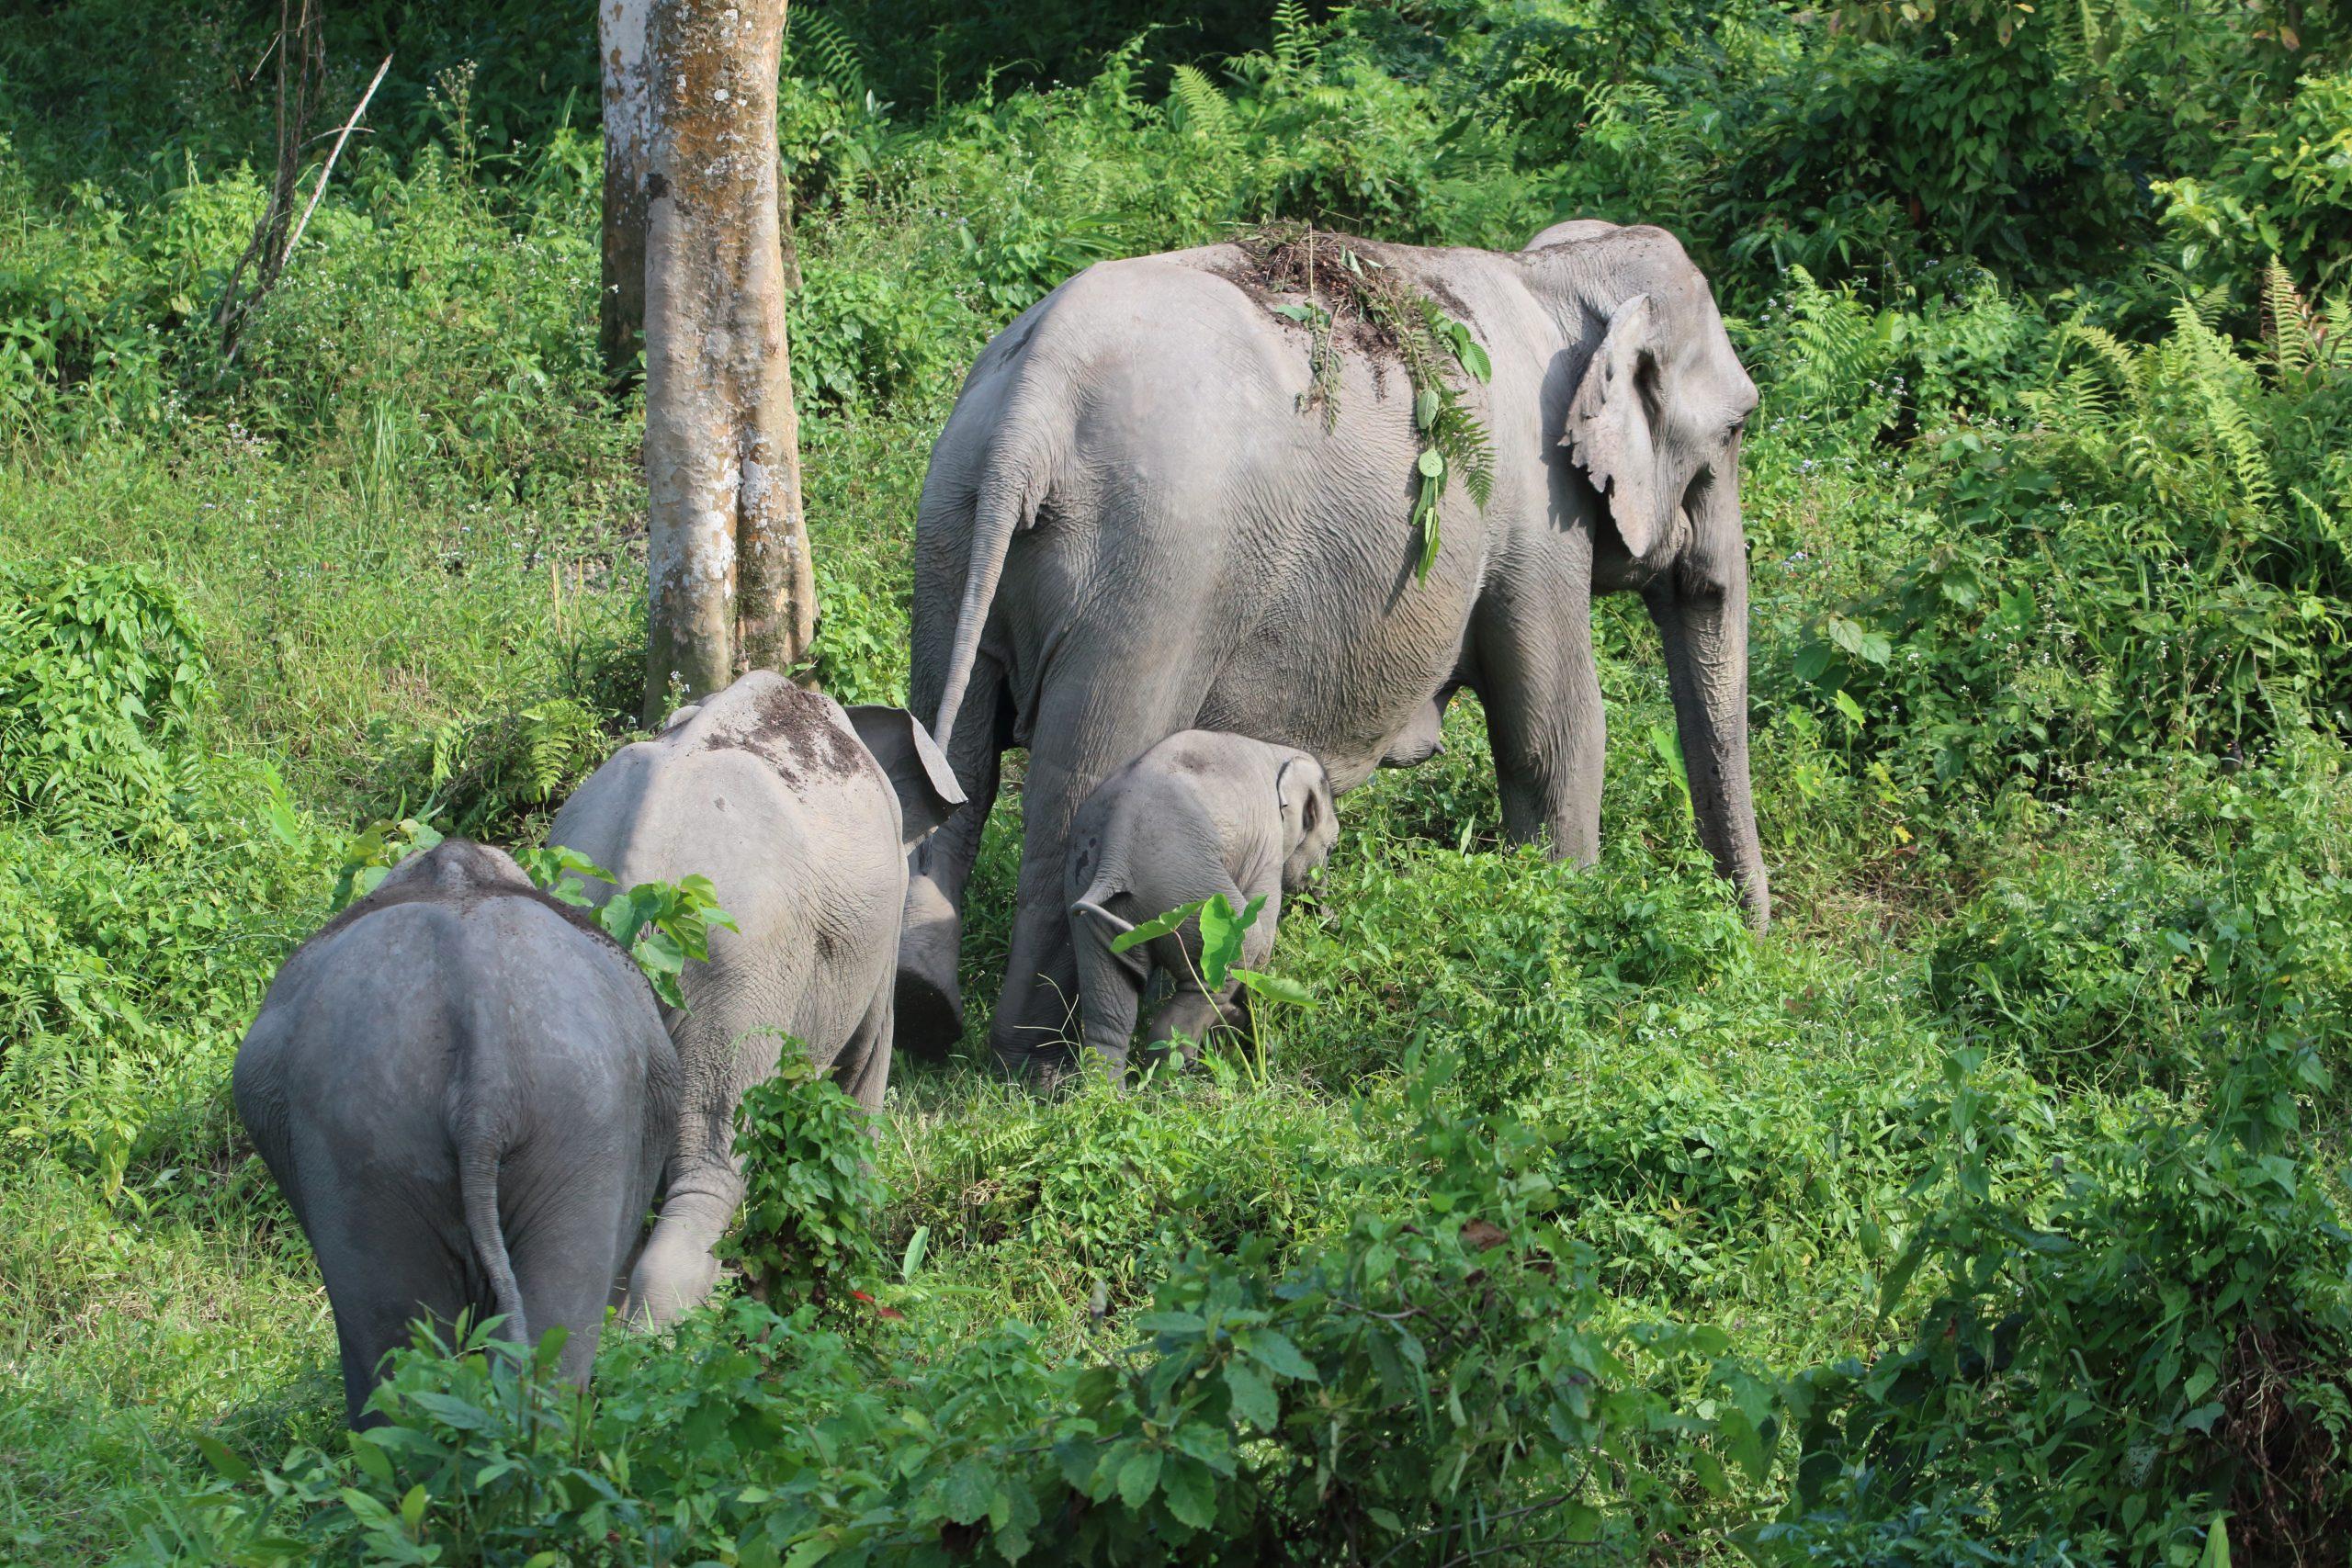 Elephant with calves